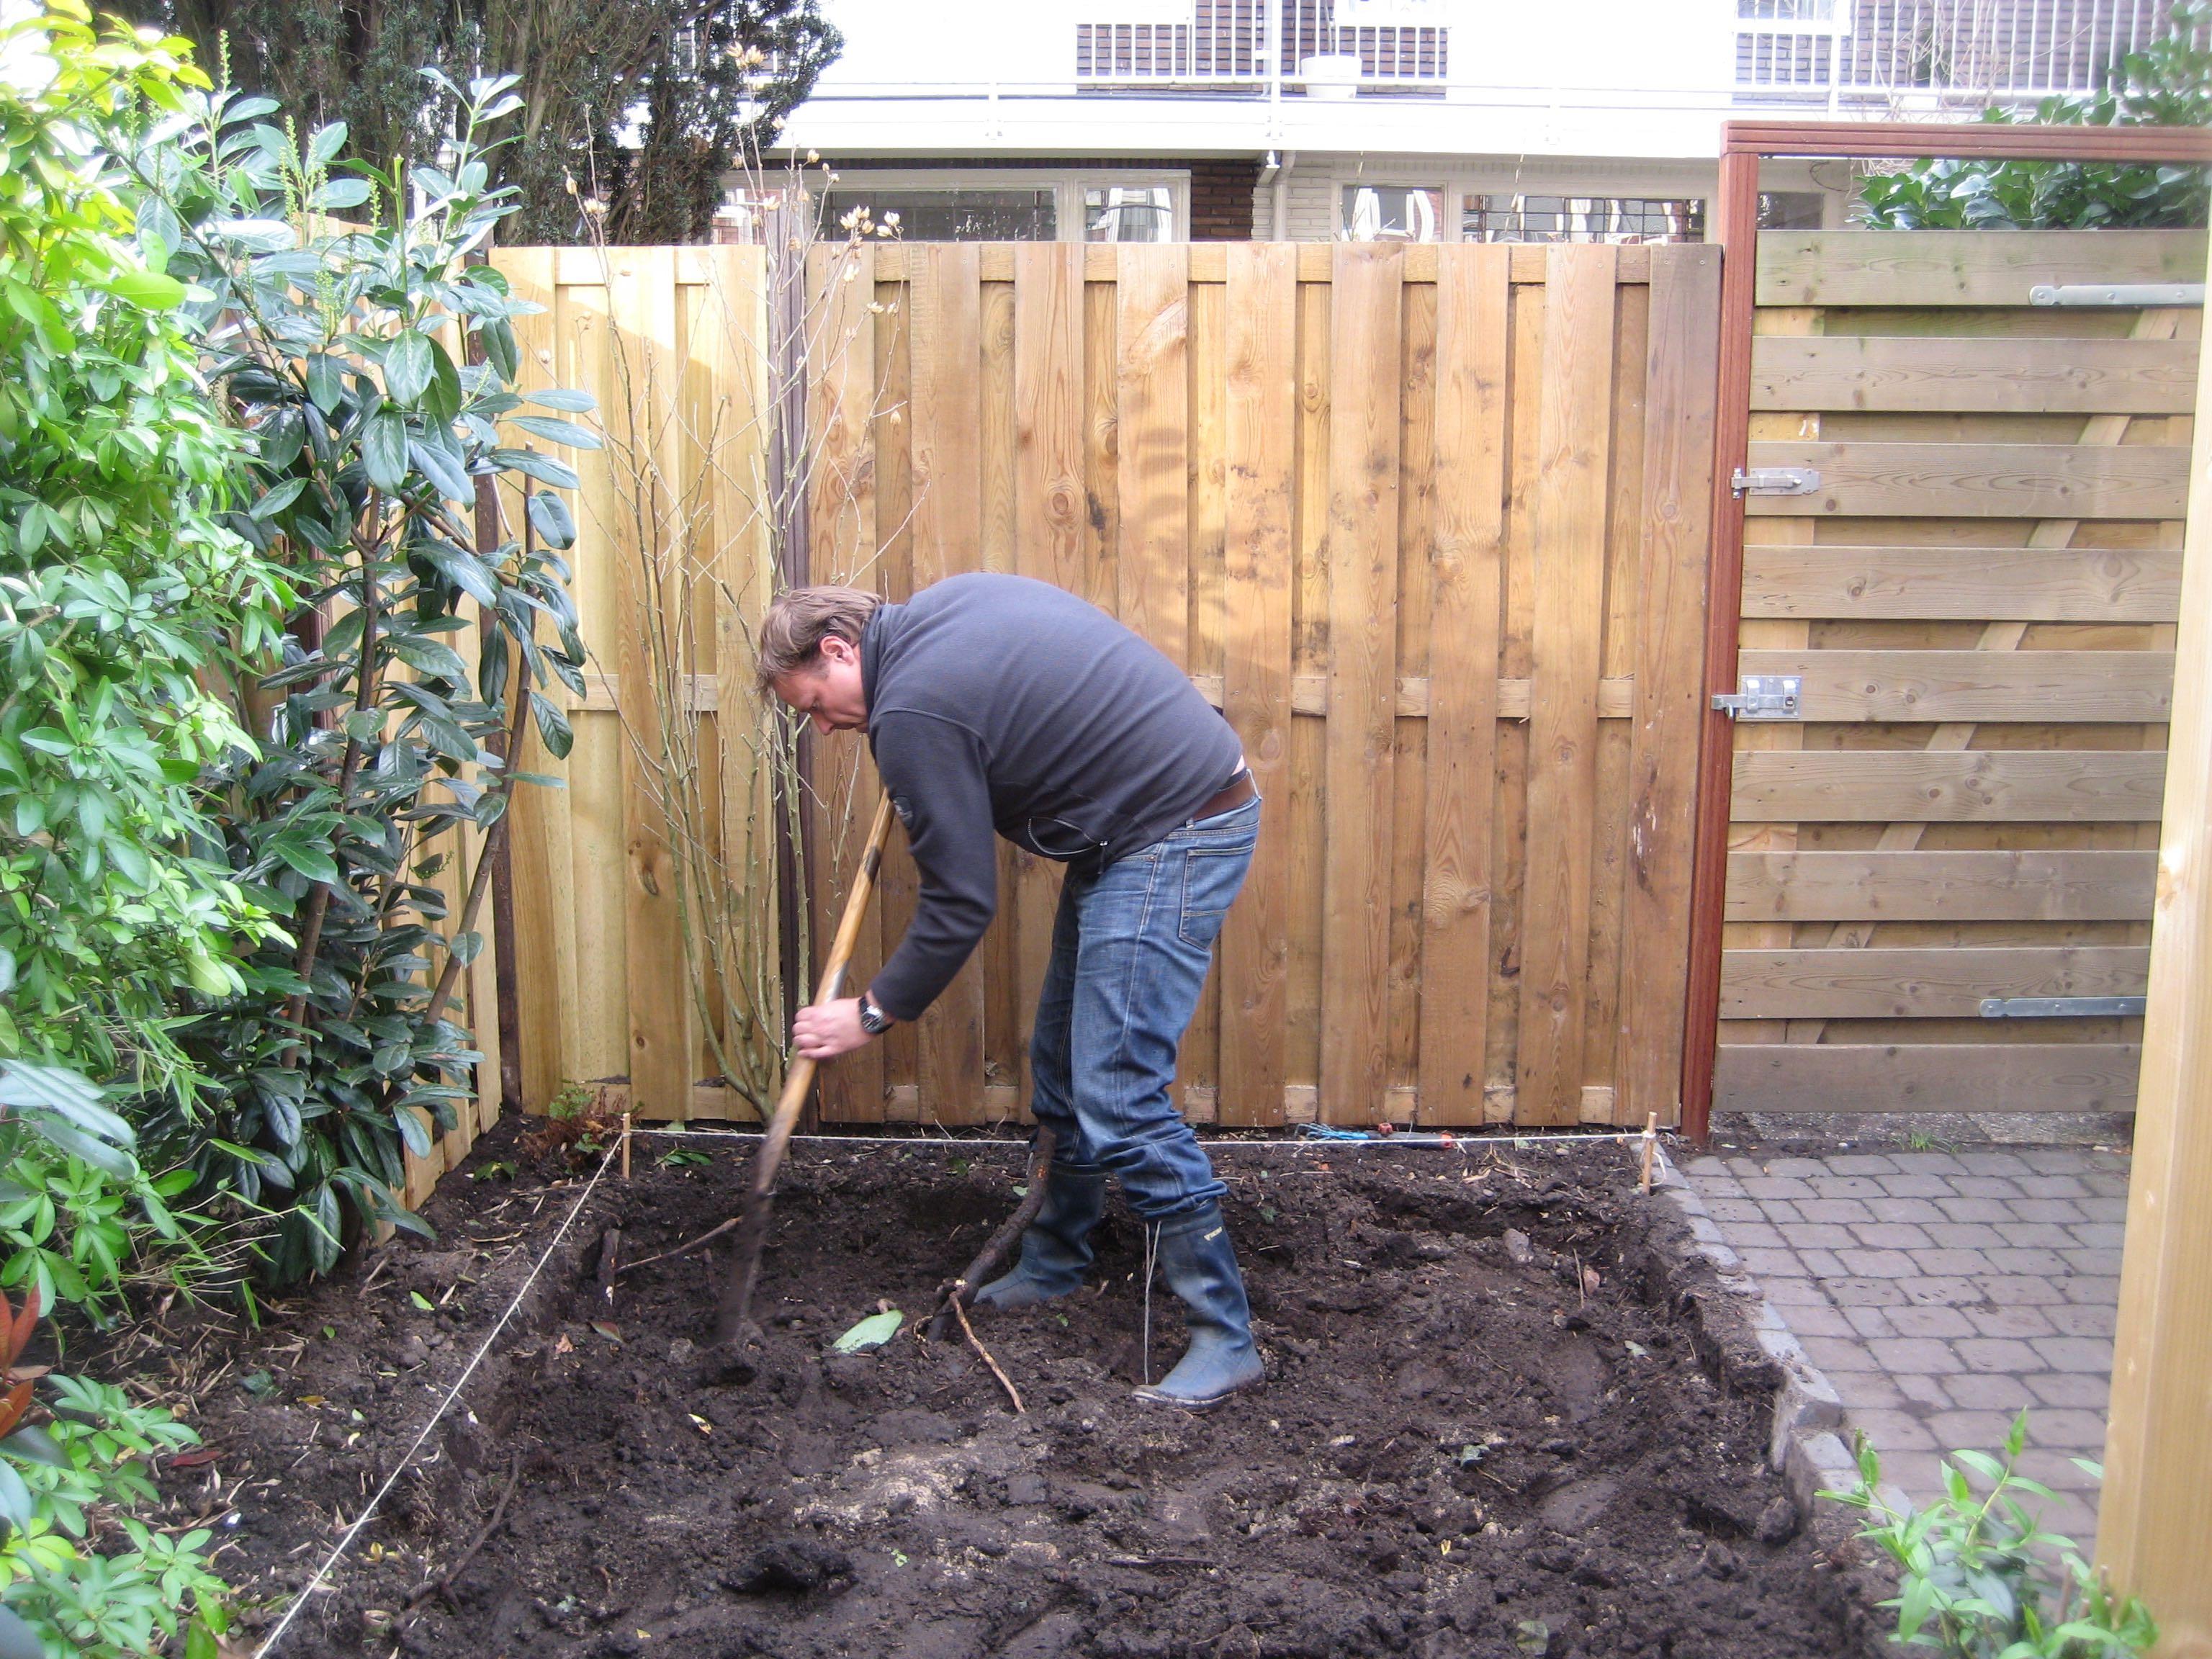 Vlonder In Tuin : Vlonder in tuin voordemakers.nl